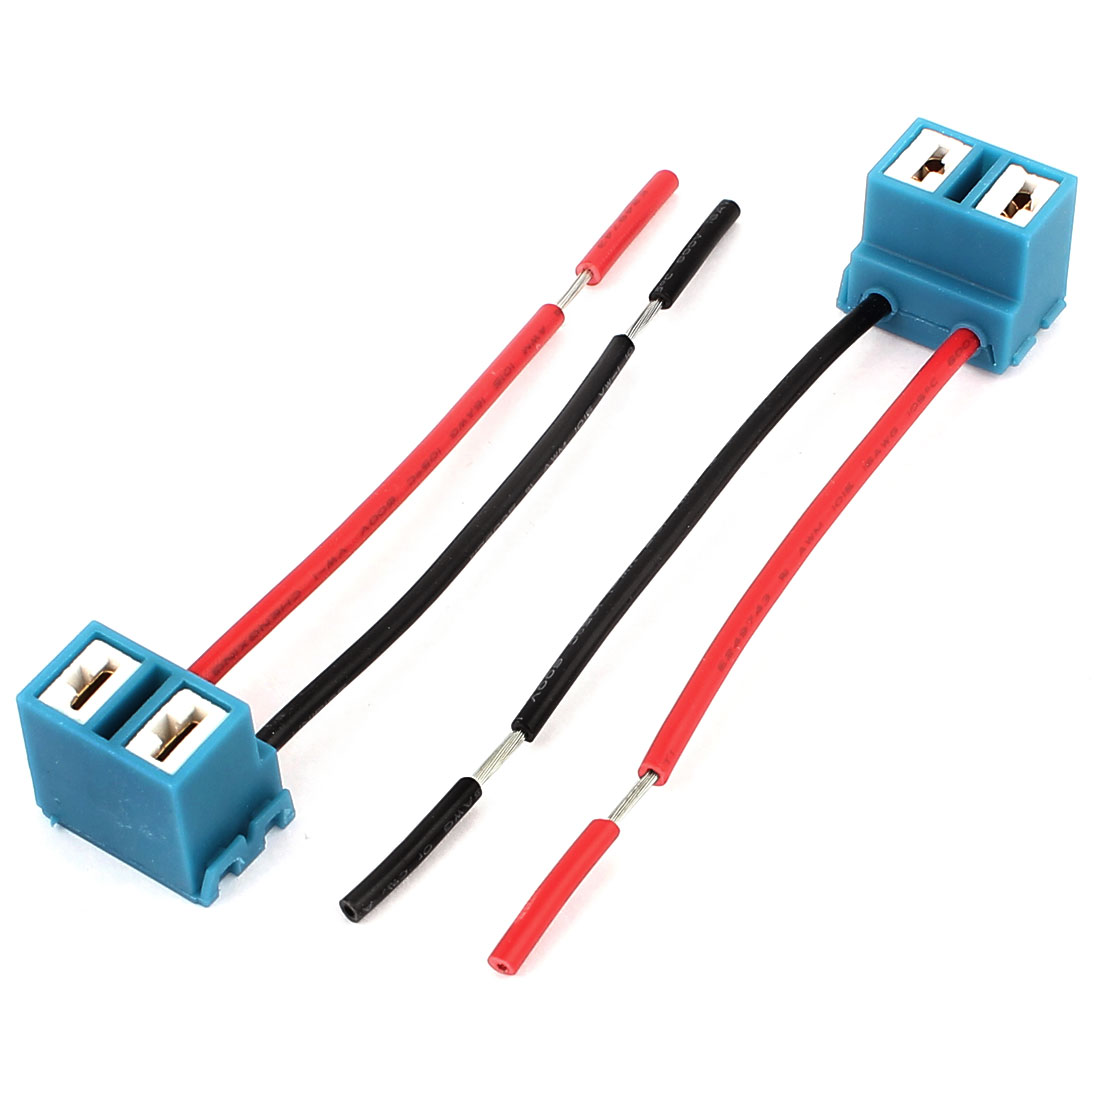 hight resolution of h7 headlight wiring harness socket wire connector plug 2pcs walmart com